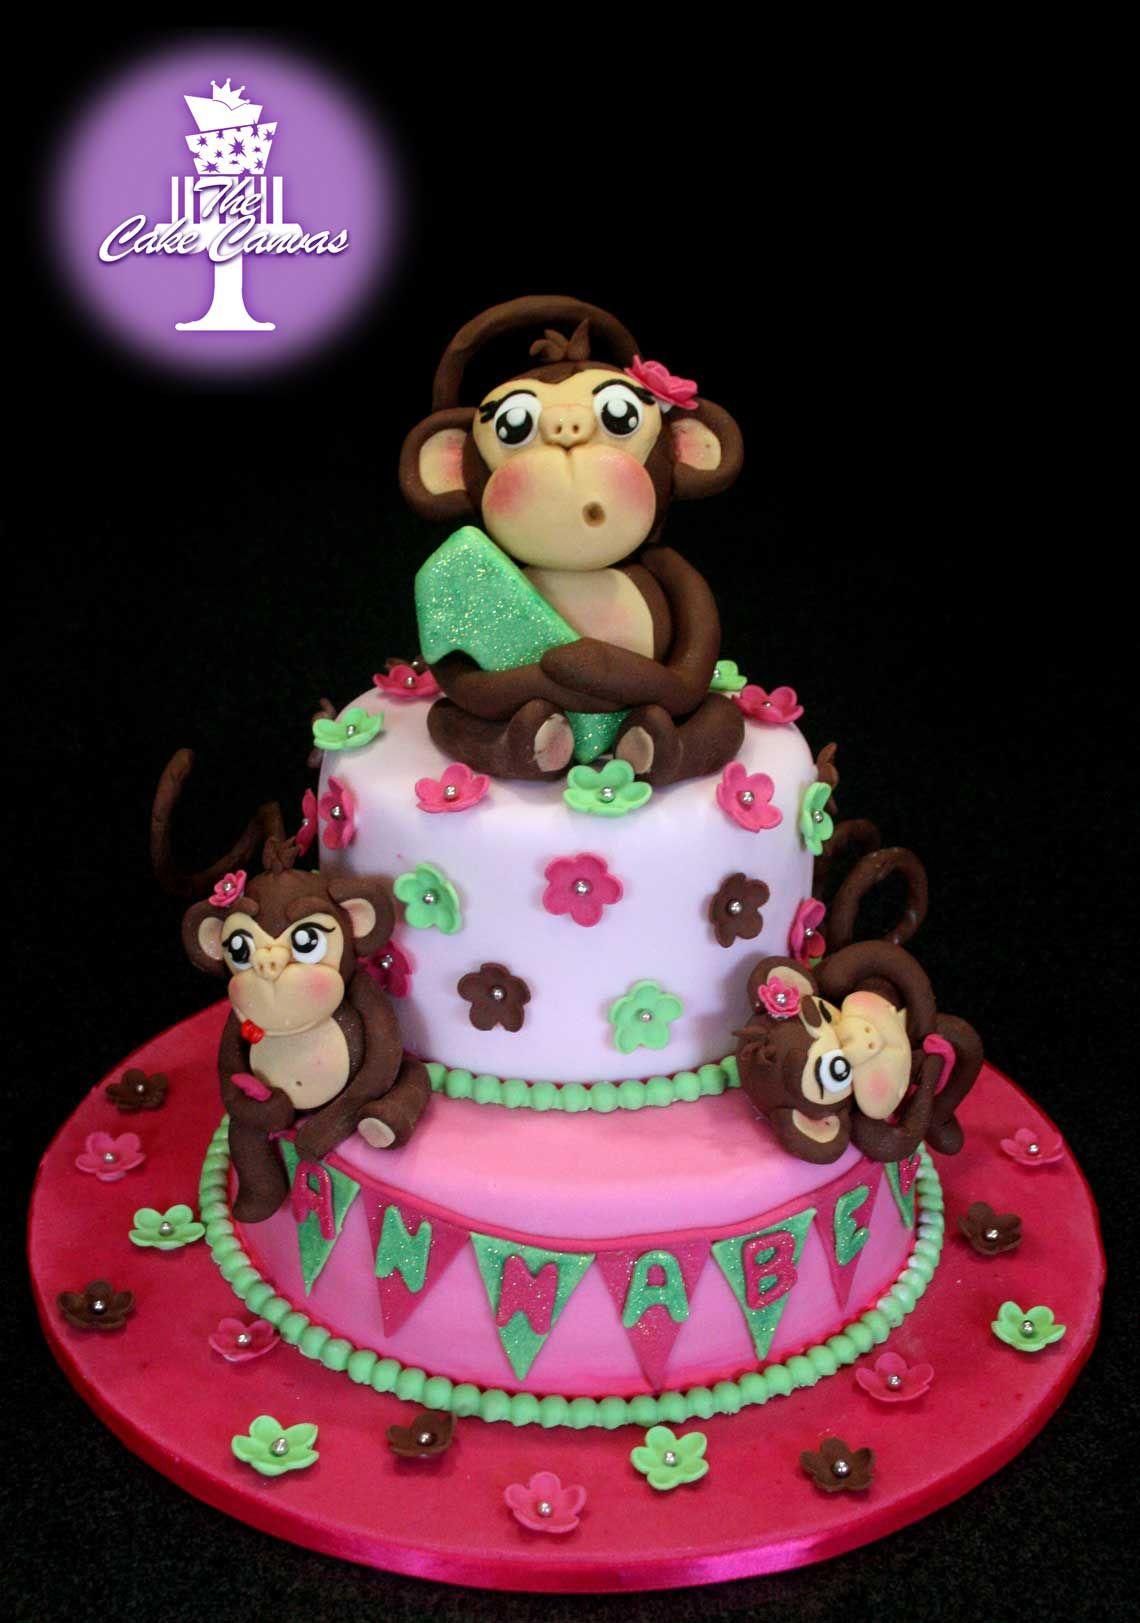 Monkey 1st Birthday Cake Girl The Cake Canvas Wedding Cakes